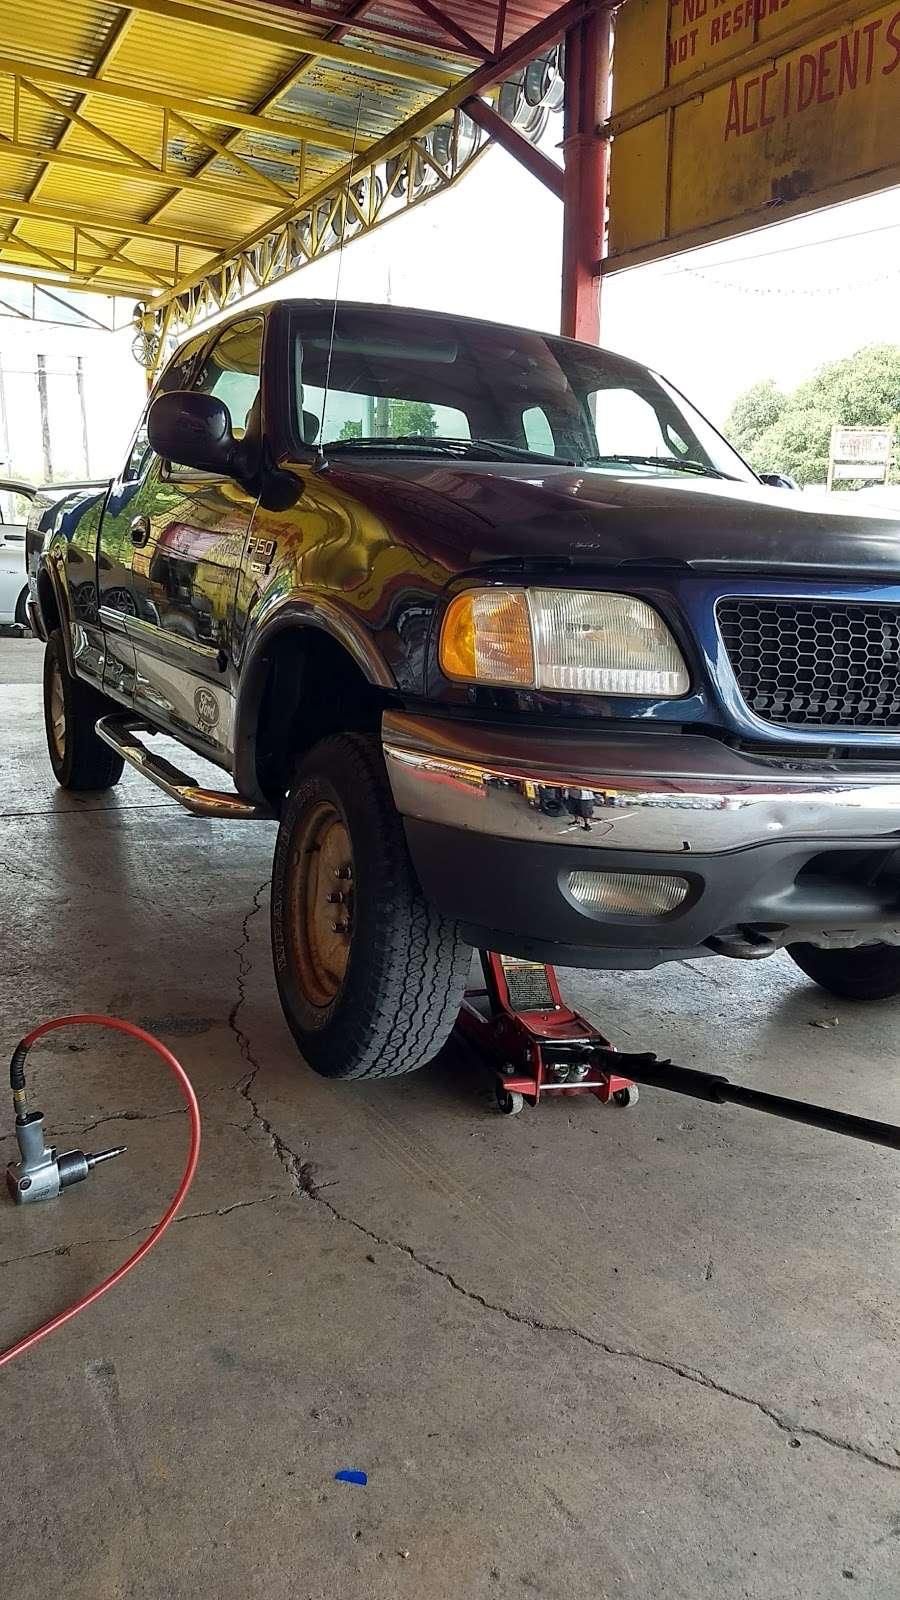 Alfonsos Tire & Wheels - car repair  | Photo 6 of 10 | Address: 432 Main St, Schertz, TX 78154, USA | Phone: (210) 658-4020